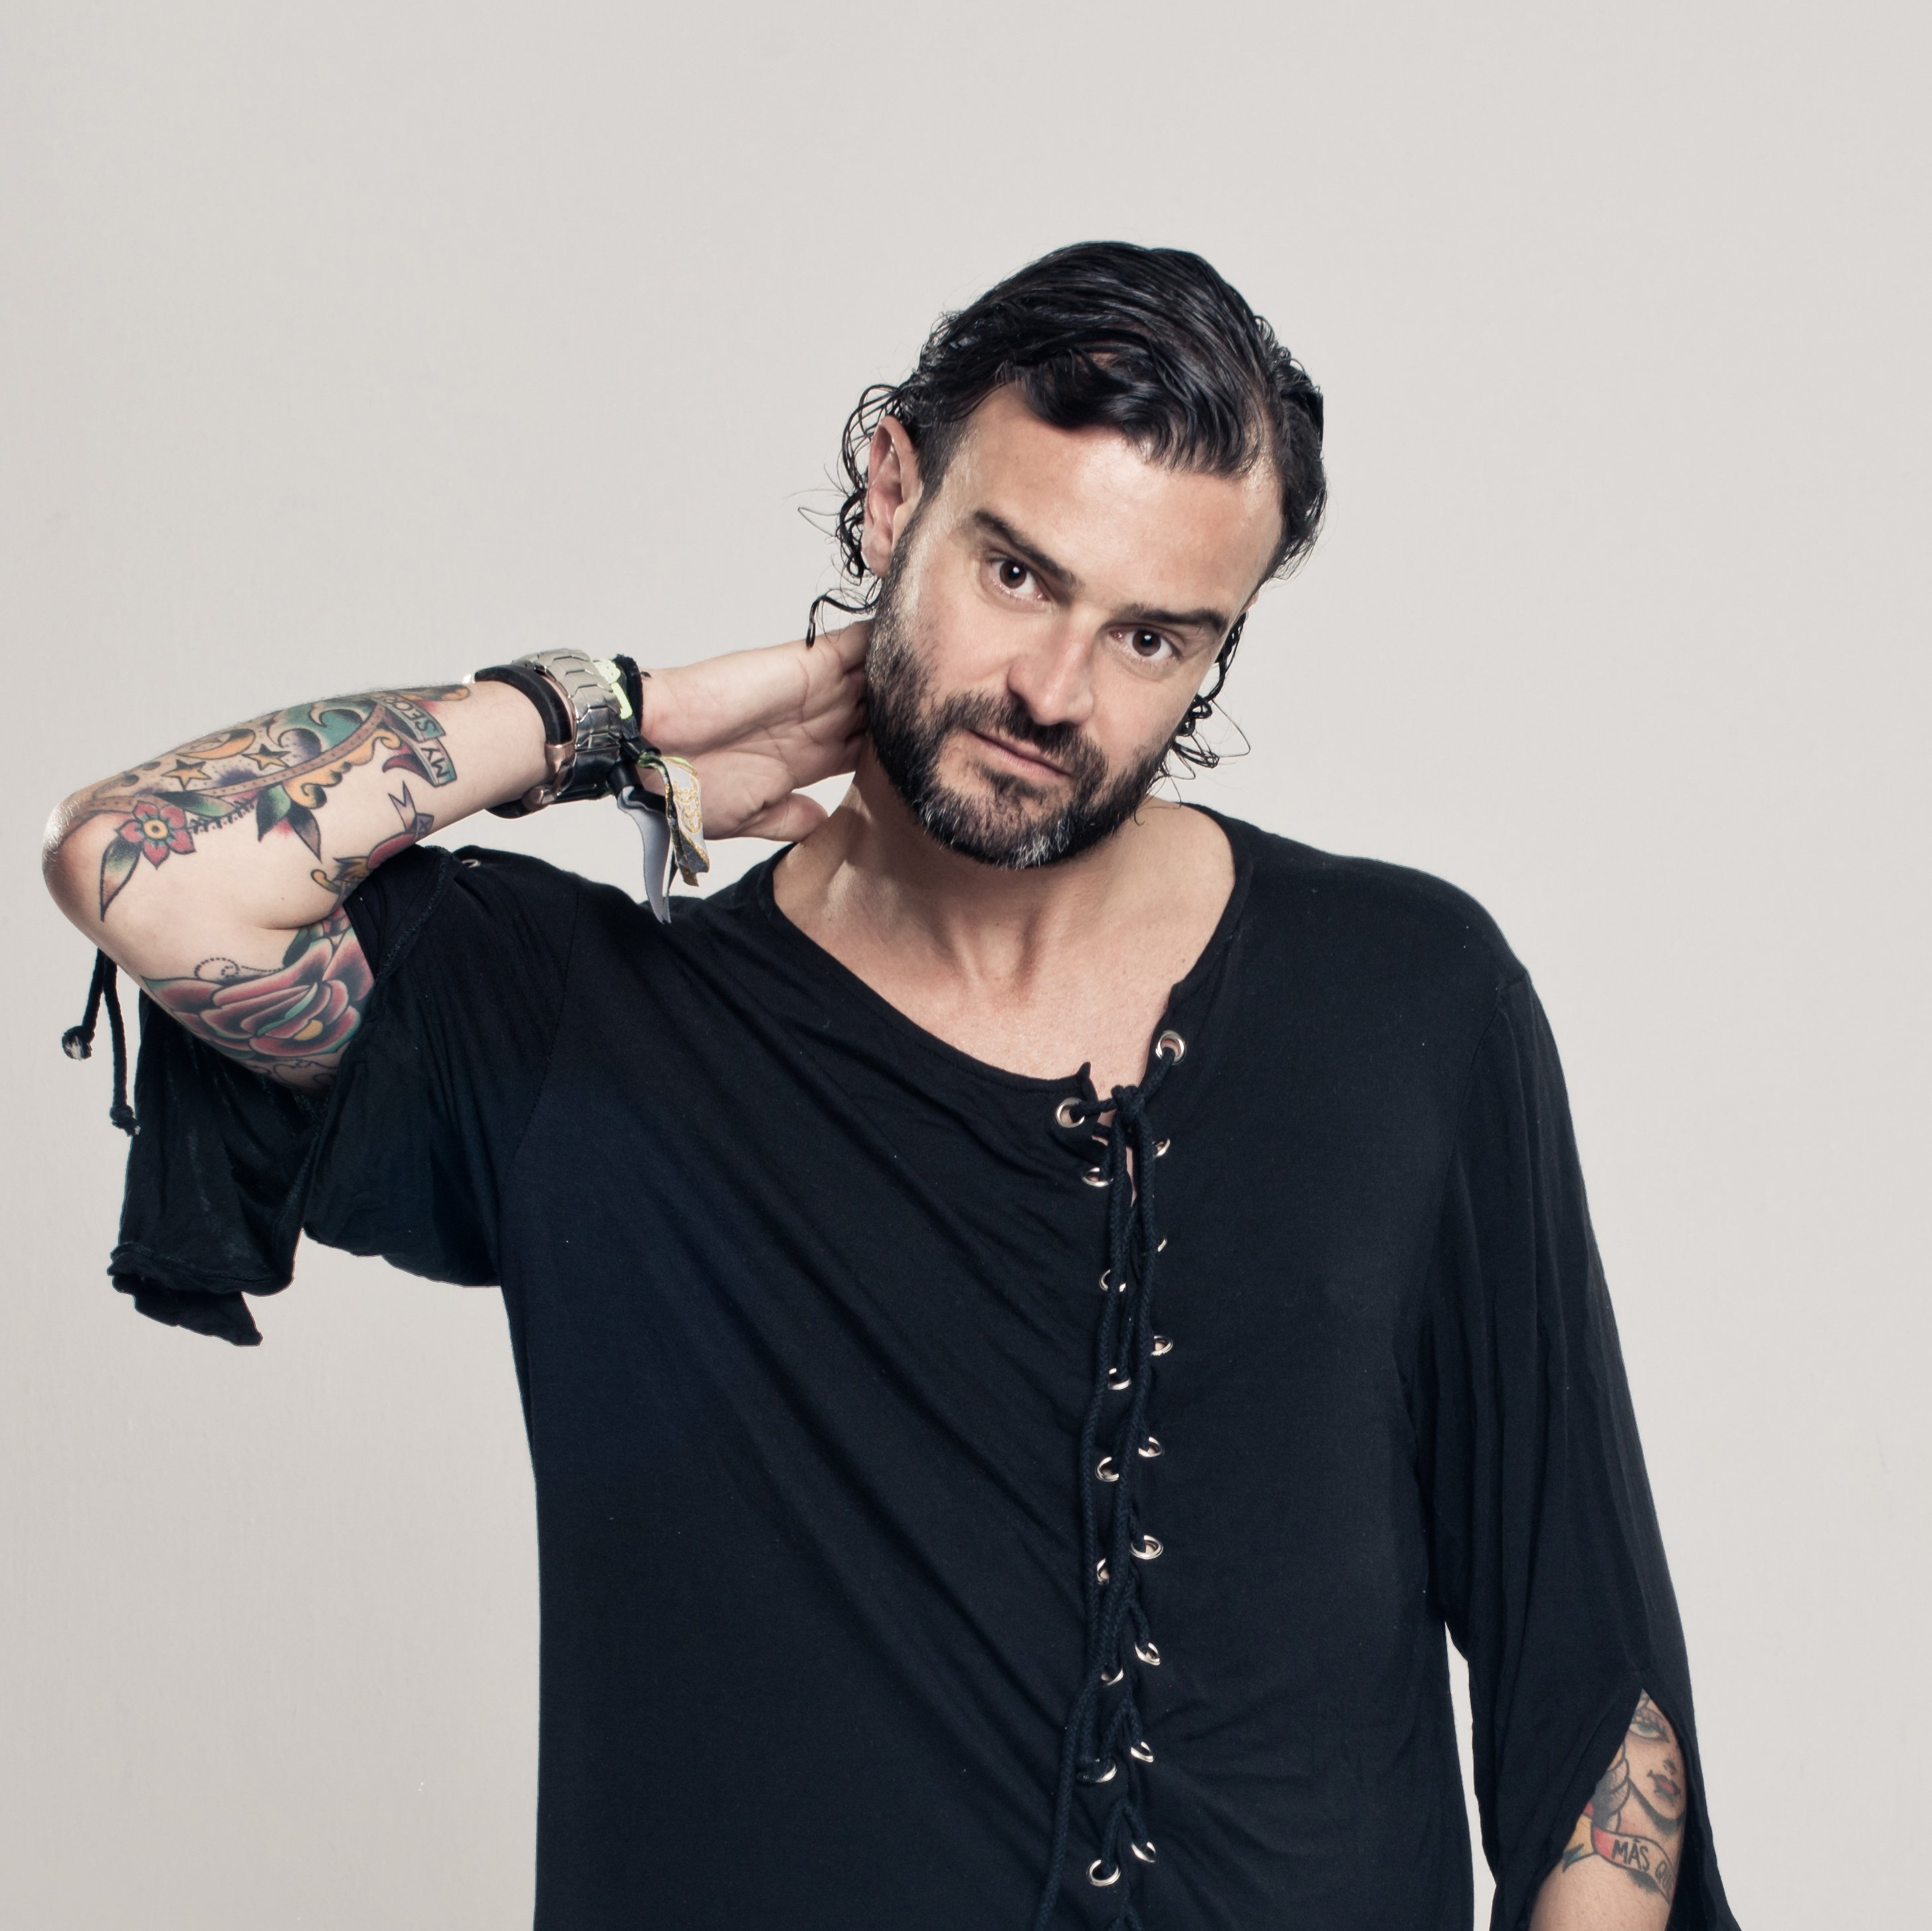 El DJ portugués Gonçalo actuará en lo alto de la Torre Schindler de Sevilla para recaudar fondos en favor de la ONG Bridges for Music